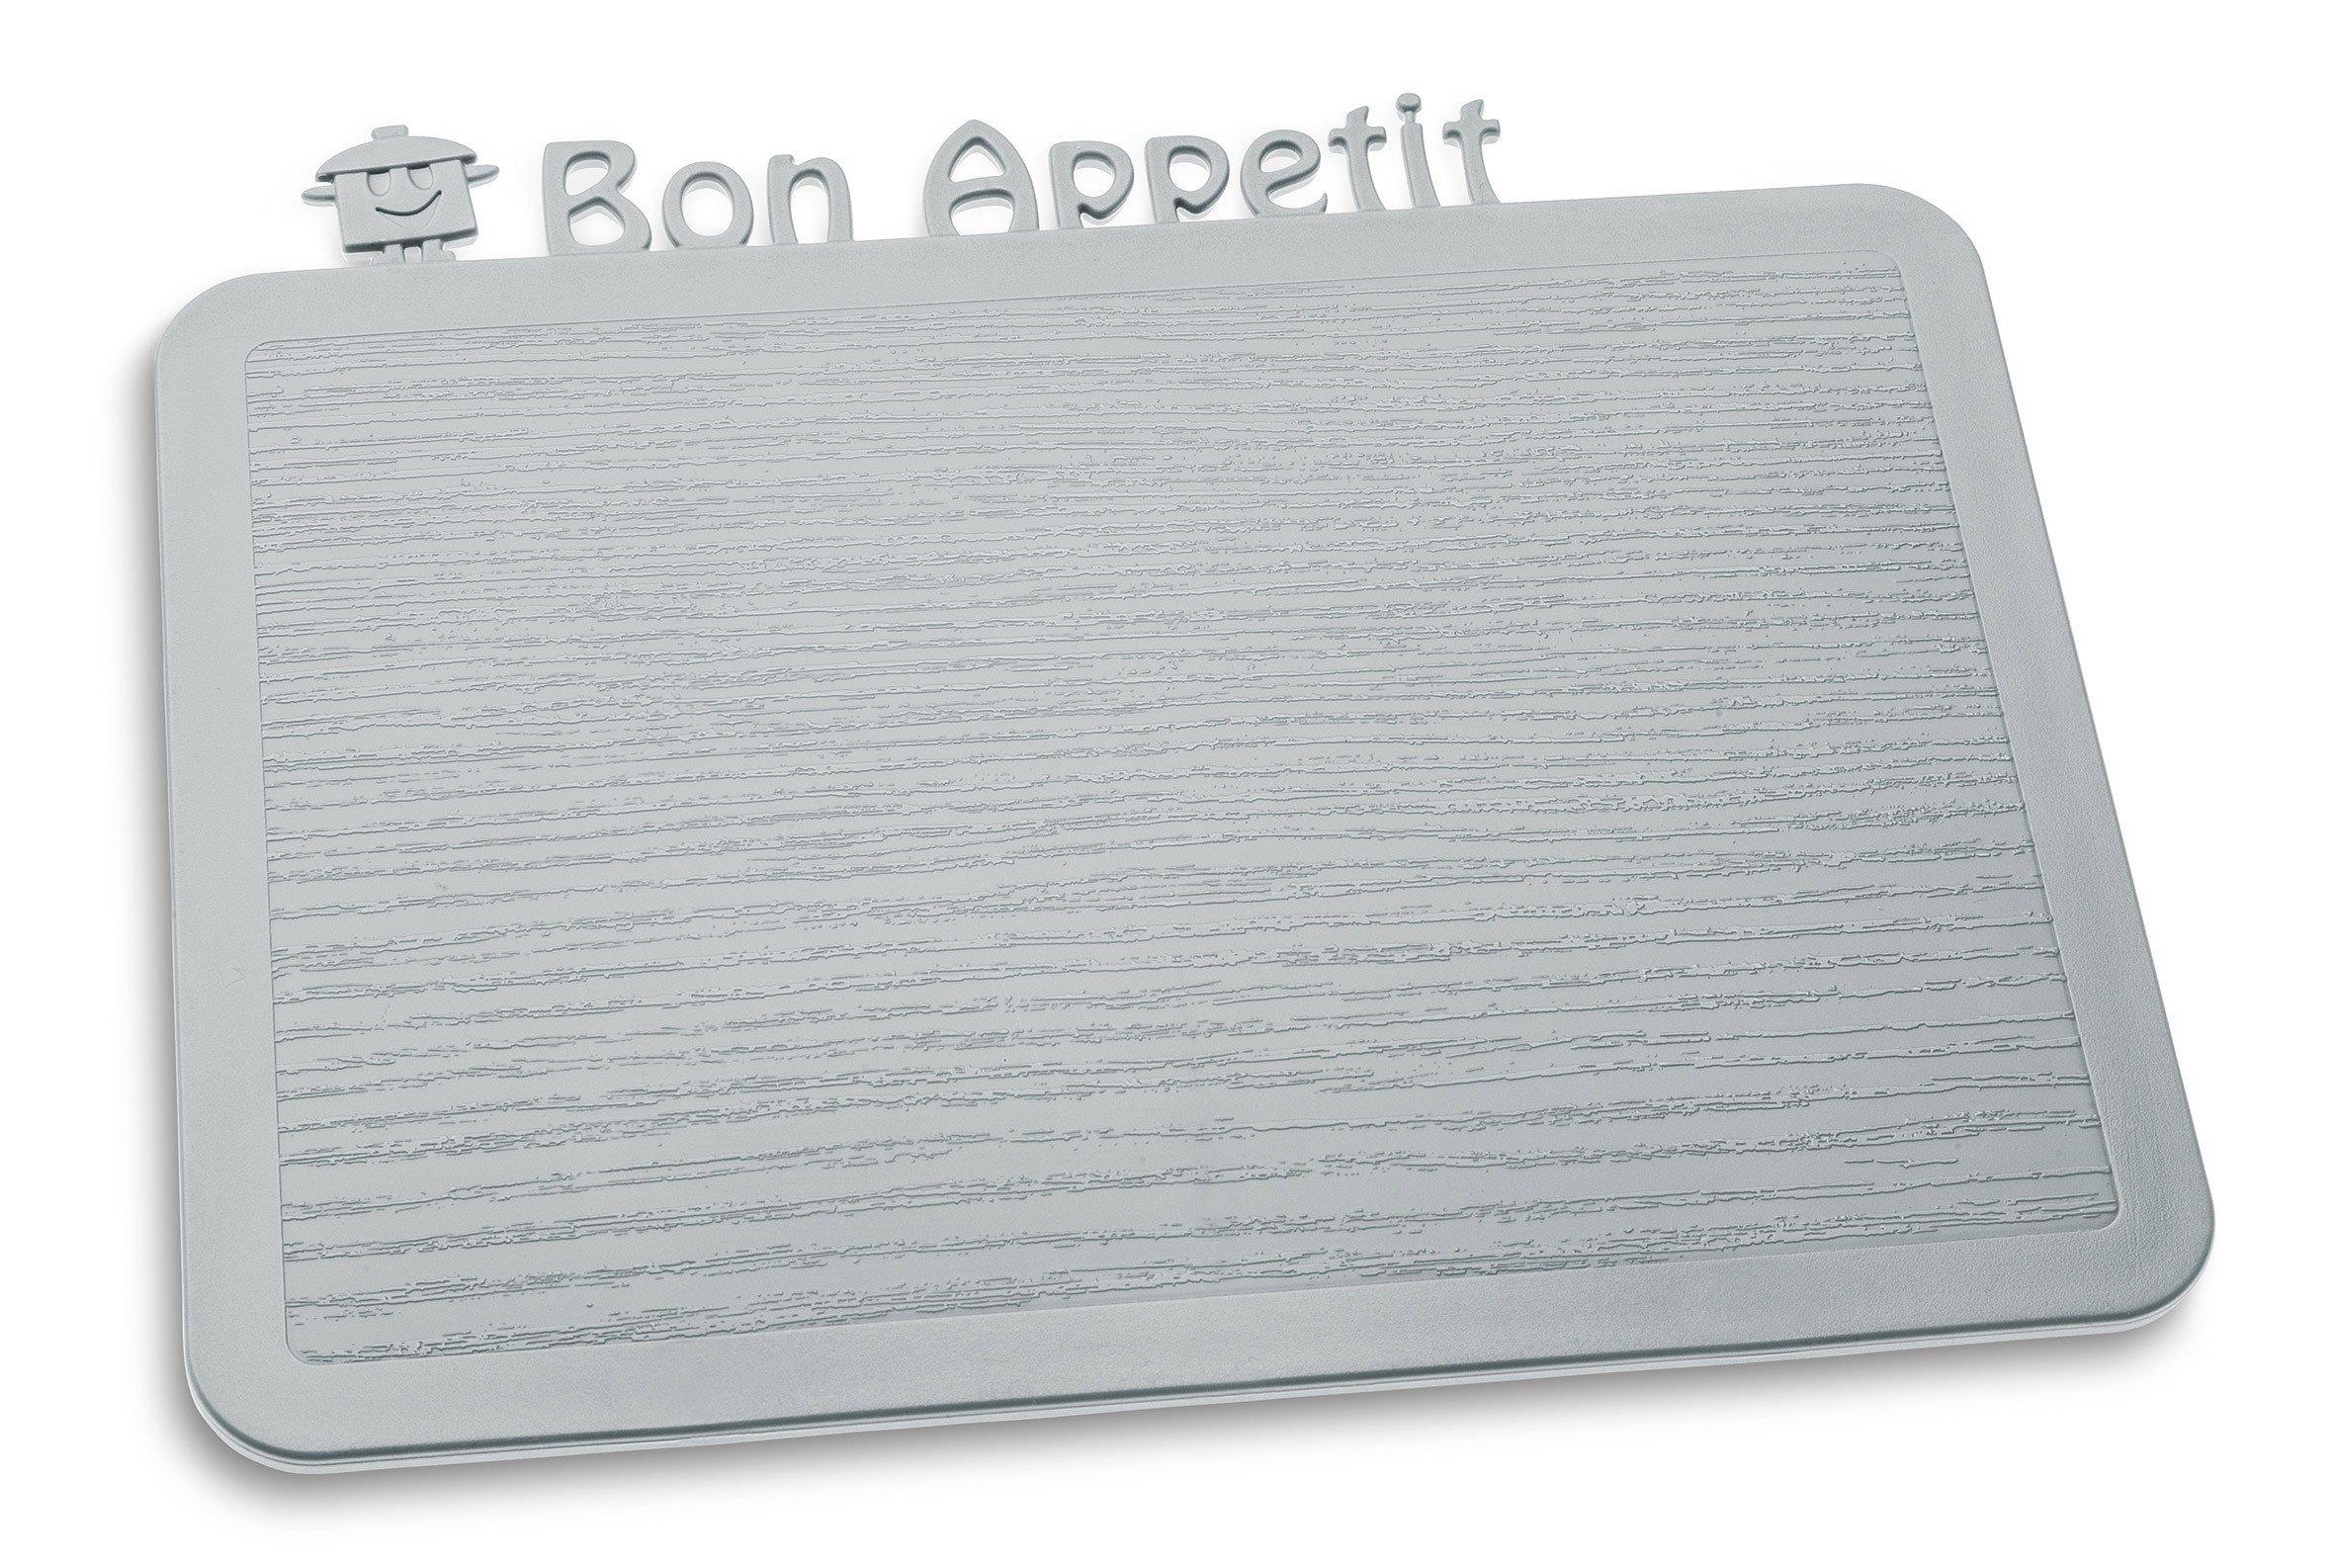 Deska śniadaniowa Happy Boards Bon Appetit szara